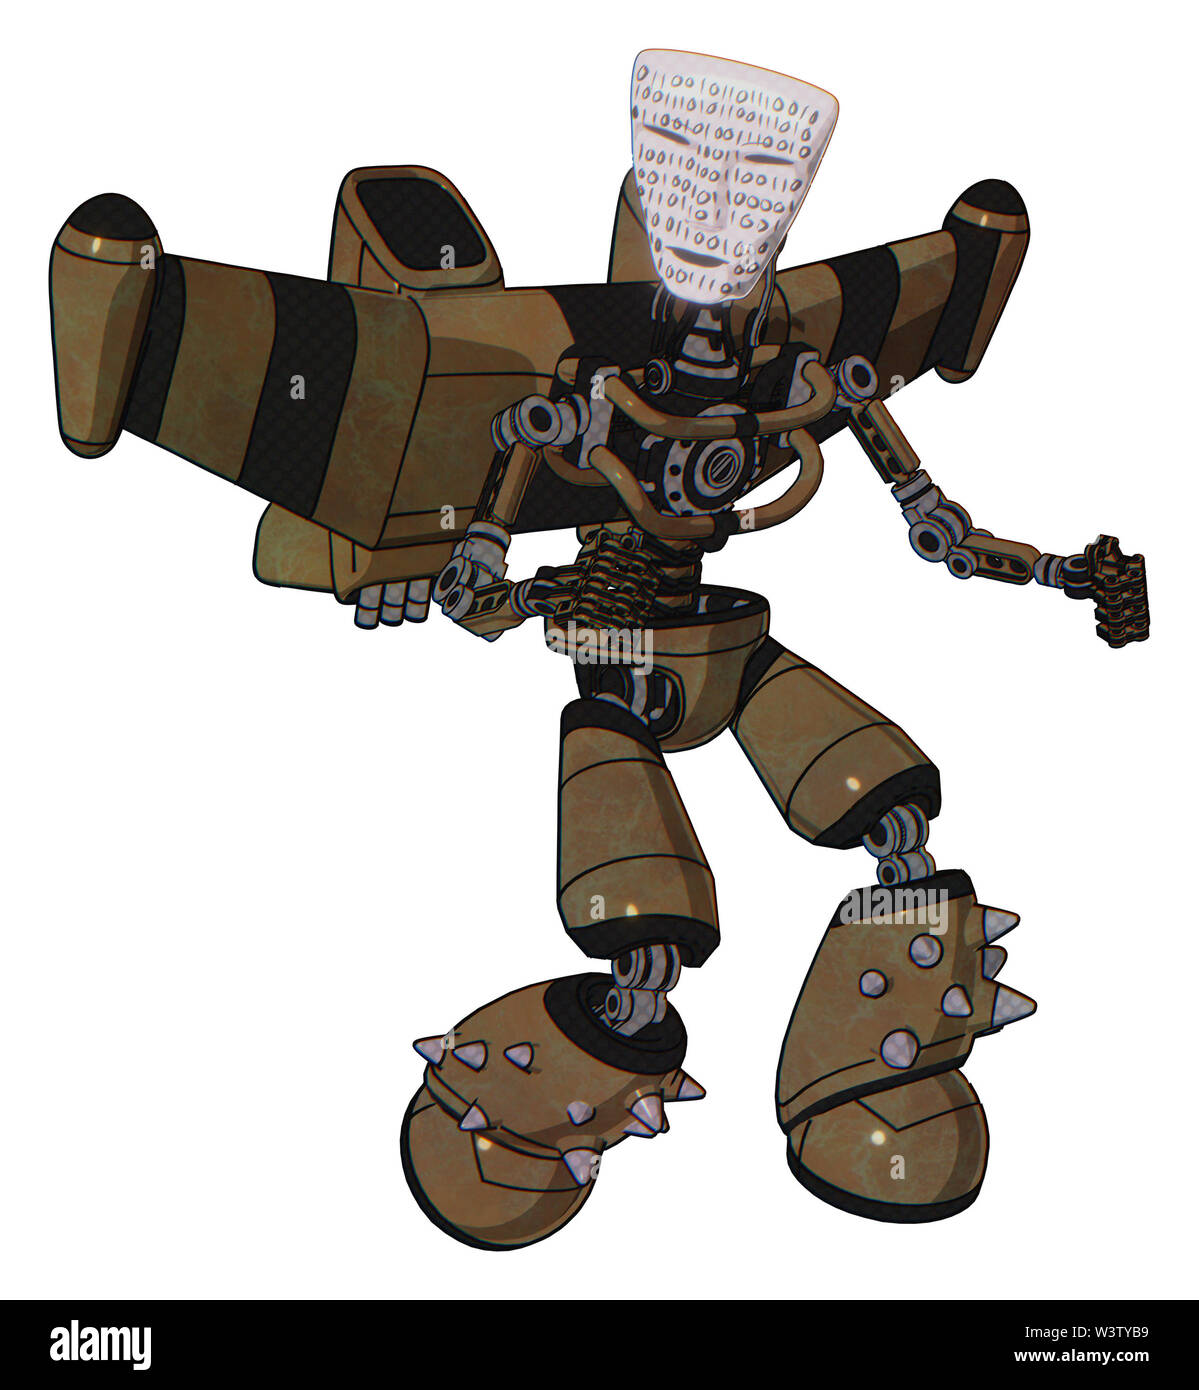 Droid containing elements: humanoid face mask, binary war paint, light chest exoshielding, stellar jet wing rocket pack, no chest plating, light leg e - Stock Image